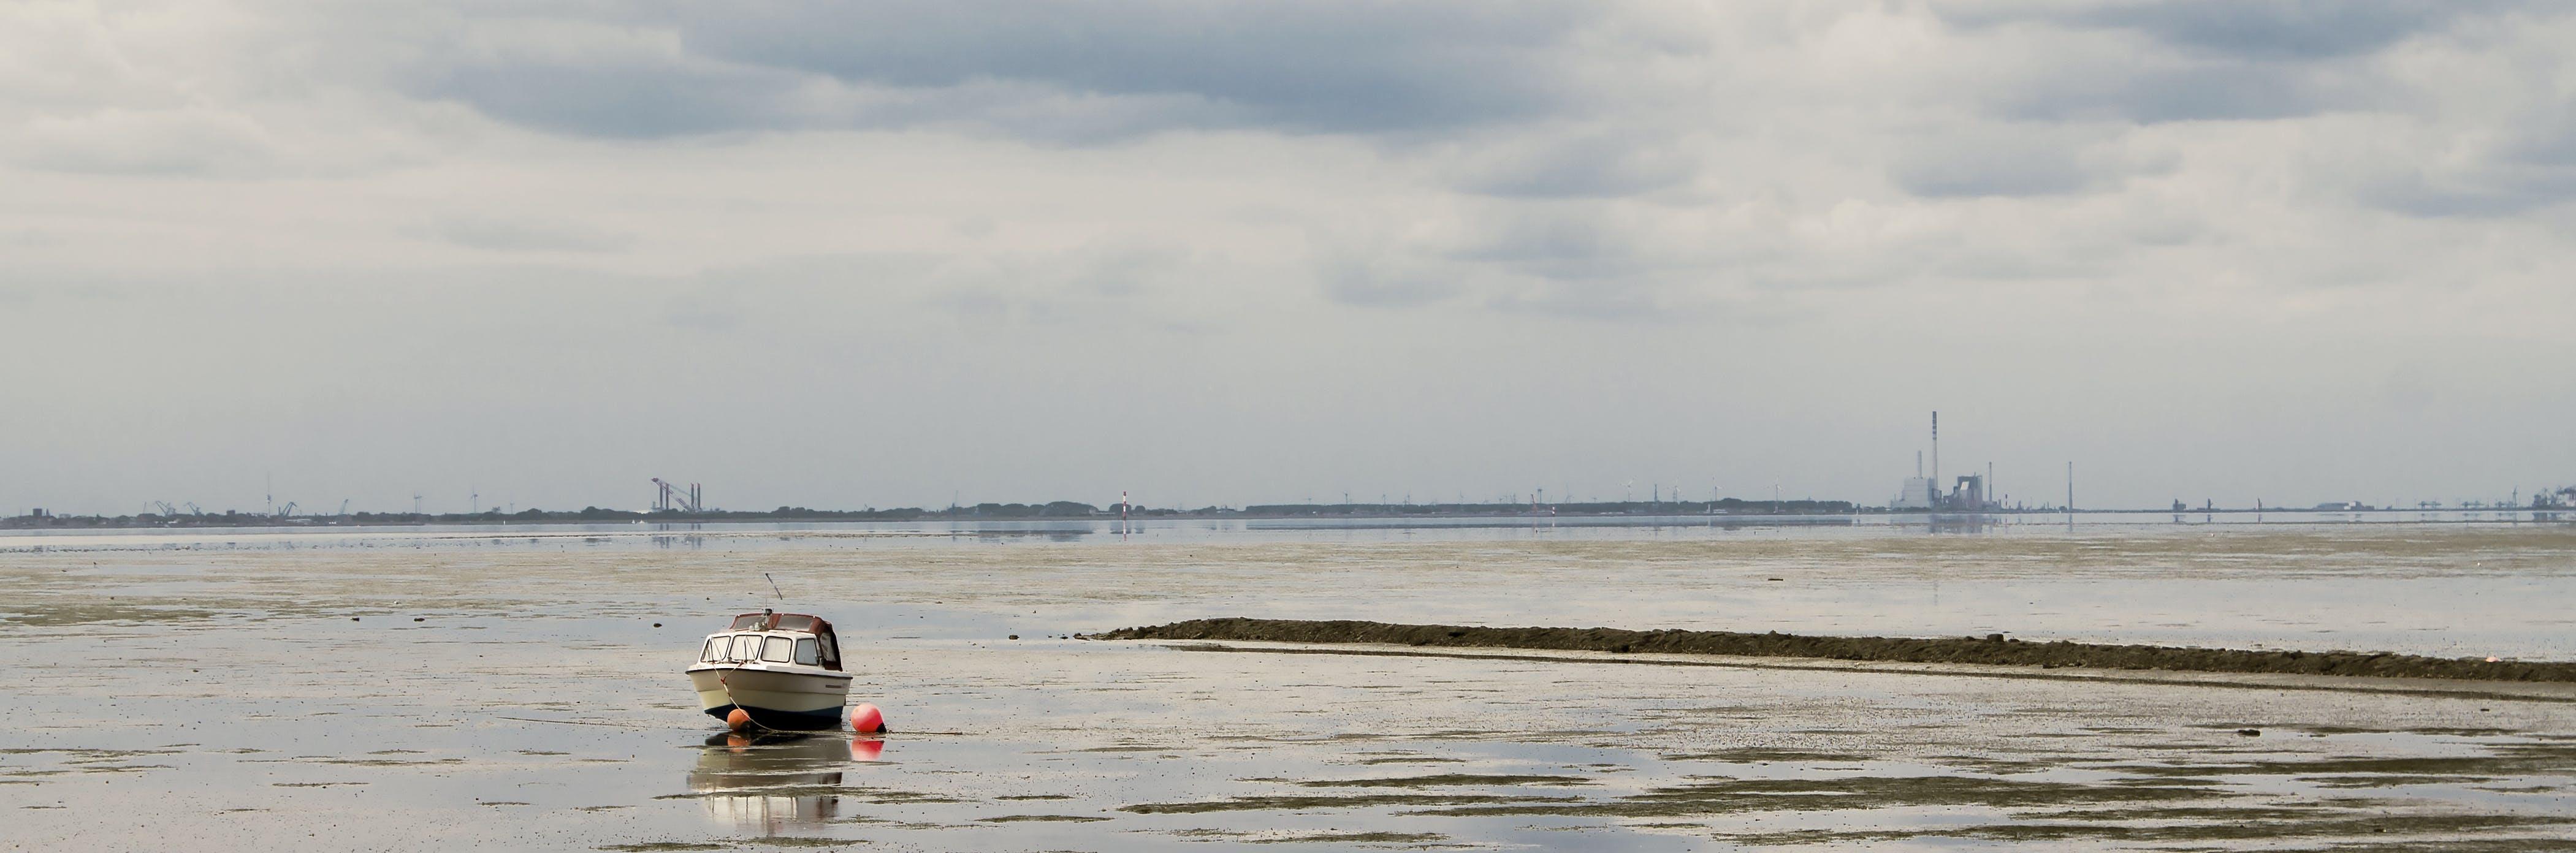 Free stock photo of landscape, ocean, sea, water